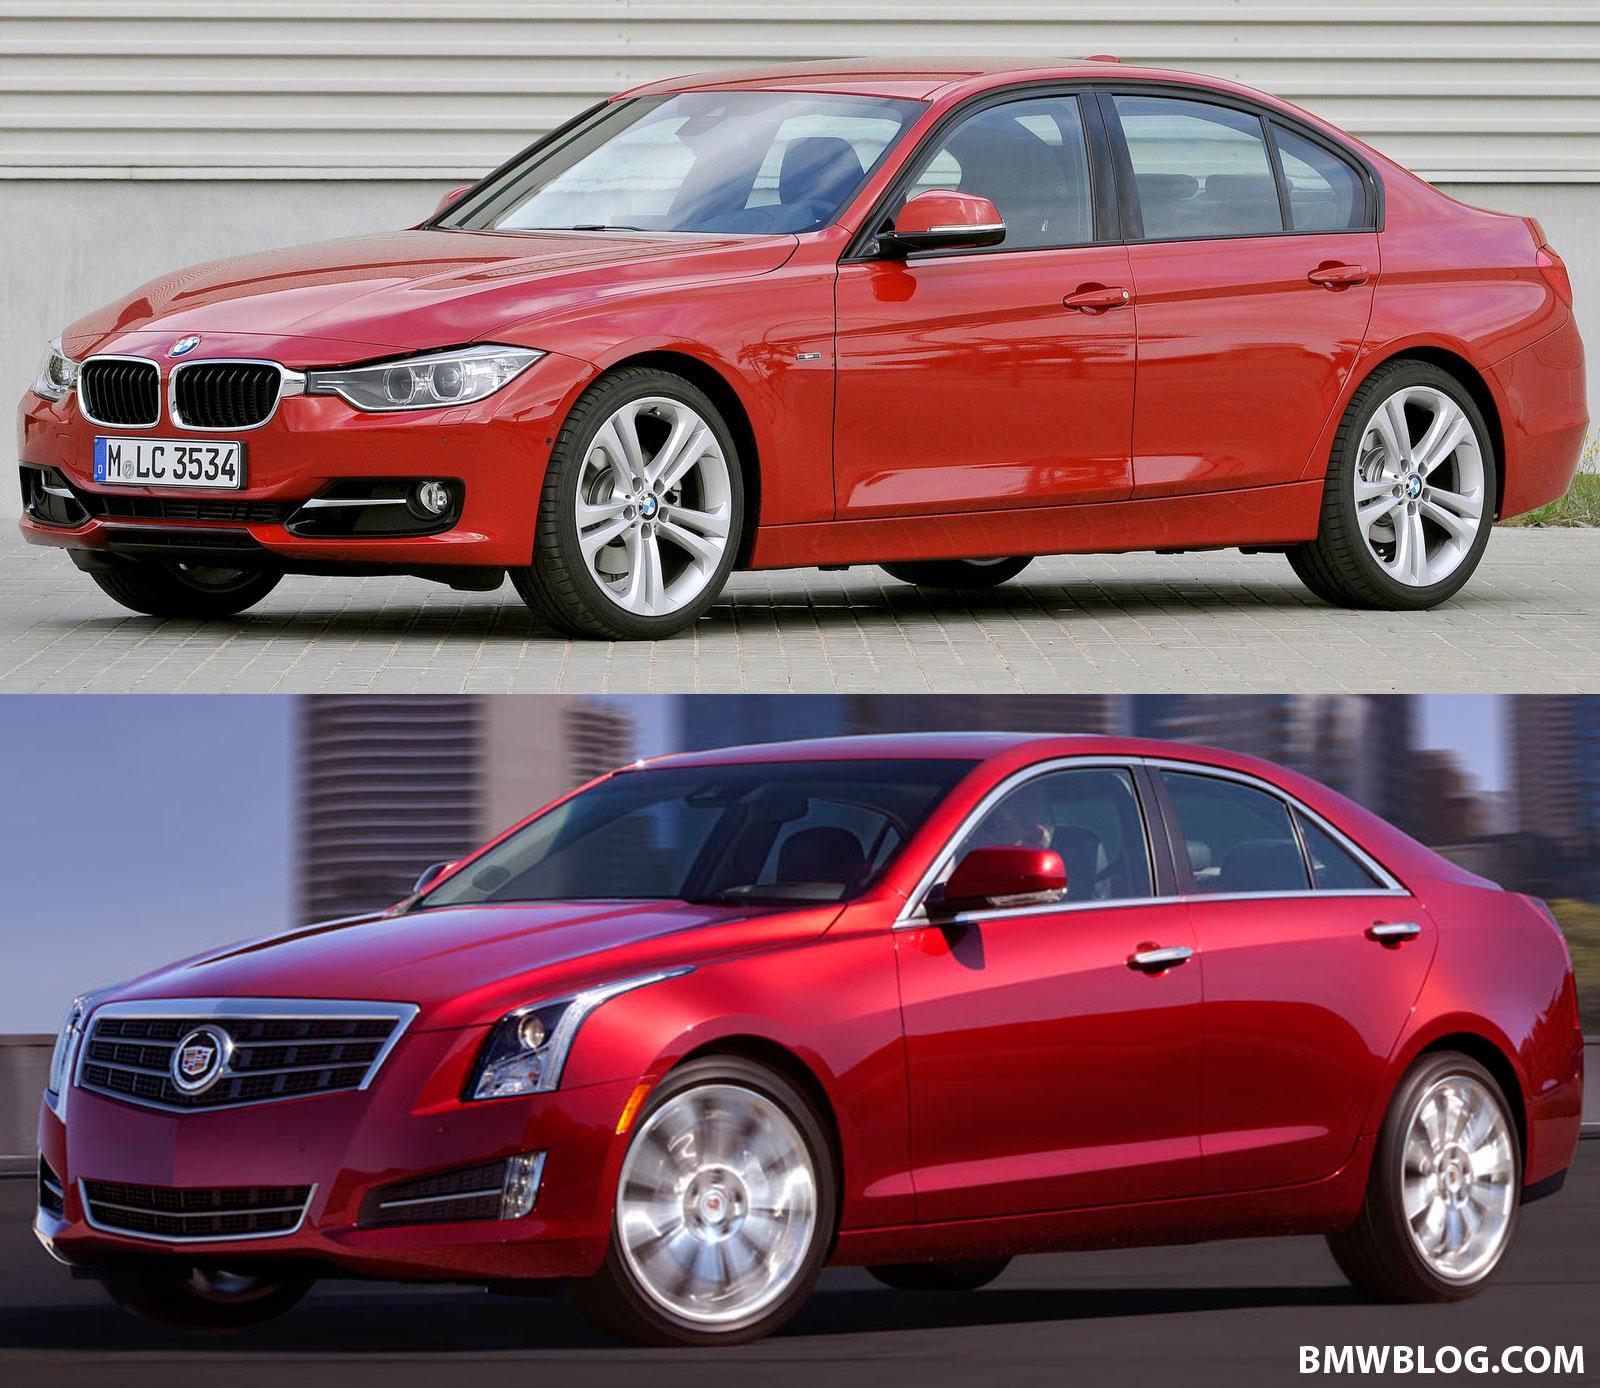 Photo Comparison: F30 BMW 3 Series vs. Cadillac ATS